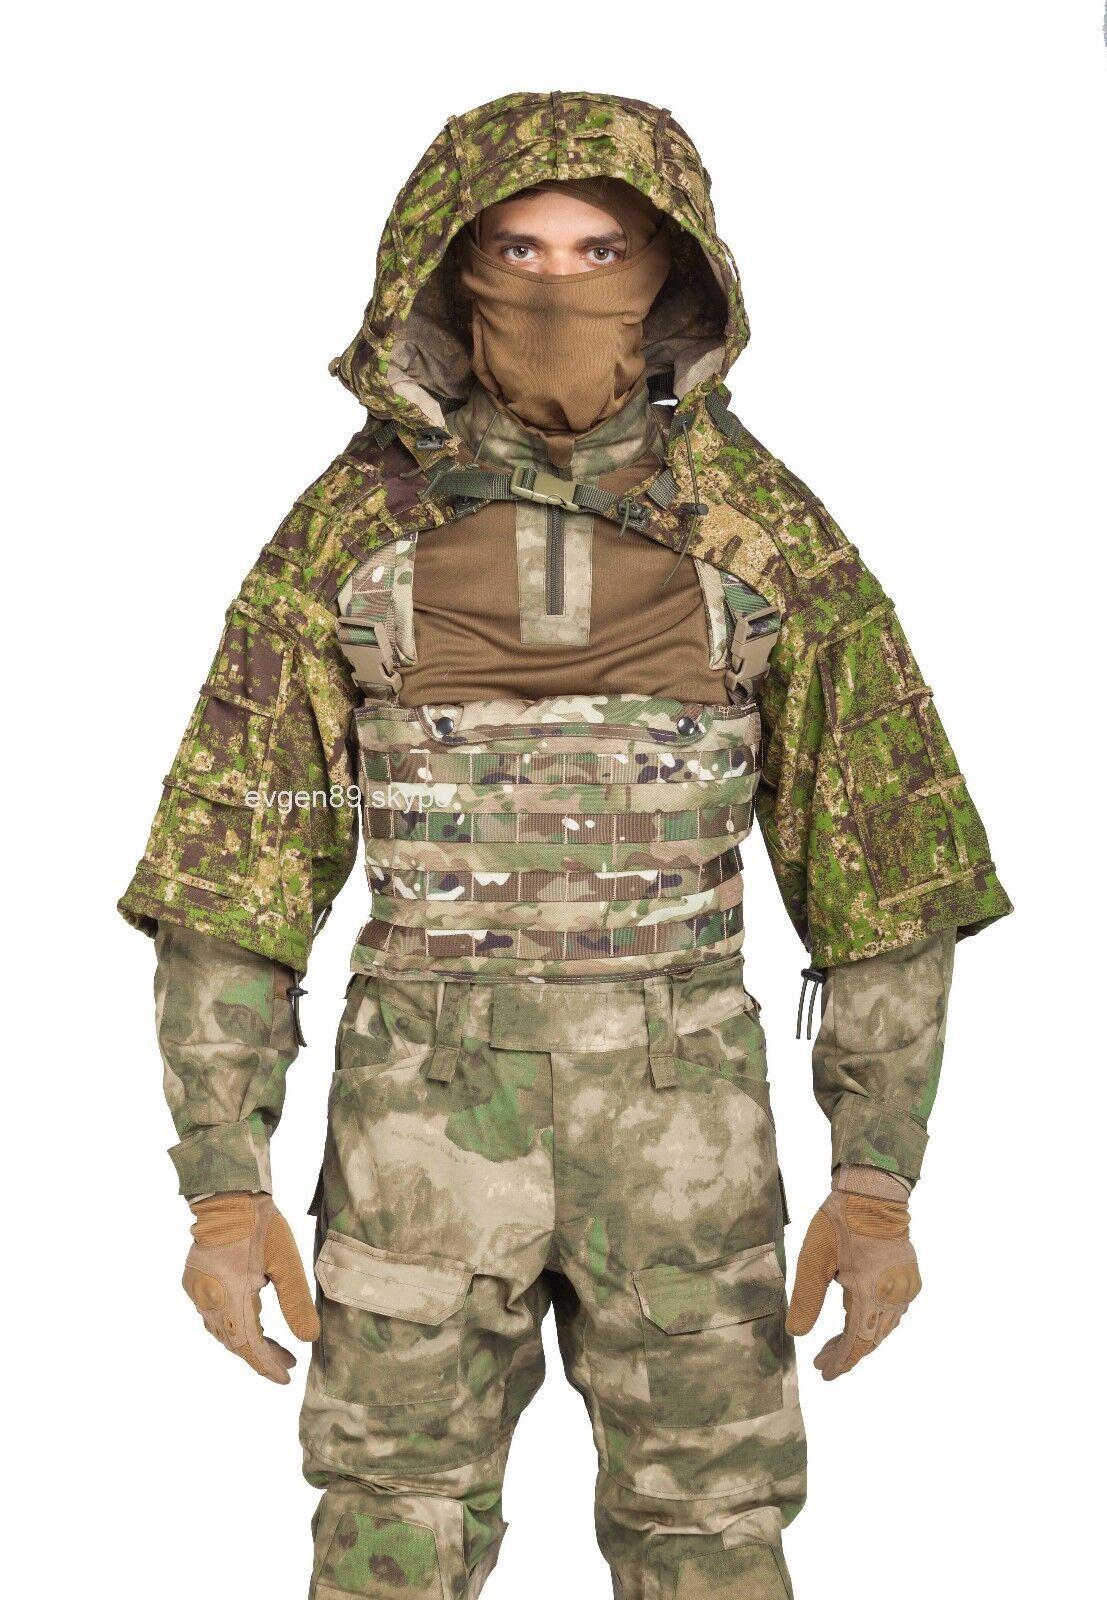 Disguise Sniper Coat    Viper Hood Russian Spetsnaz Ripstop Pencott Greenzone  at cheap